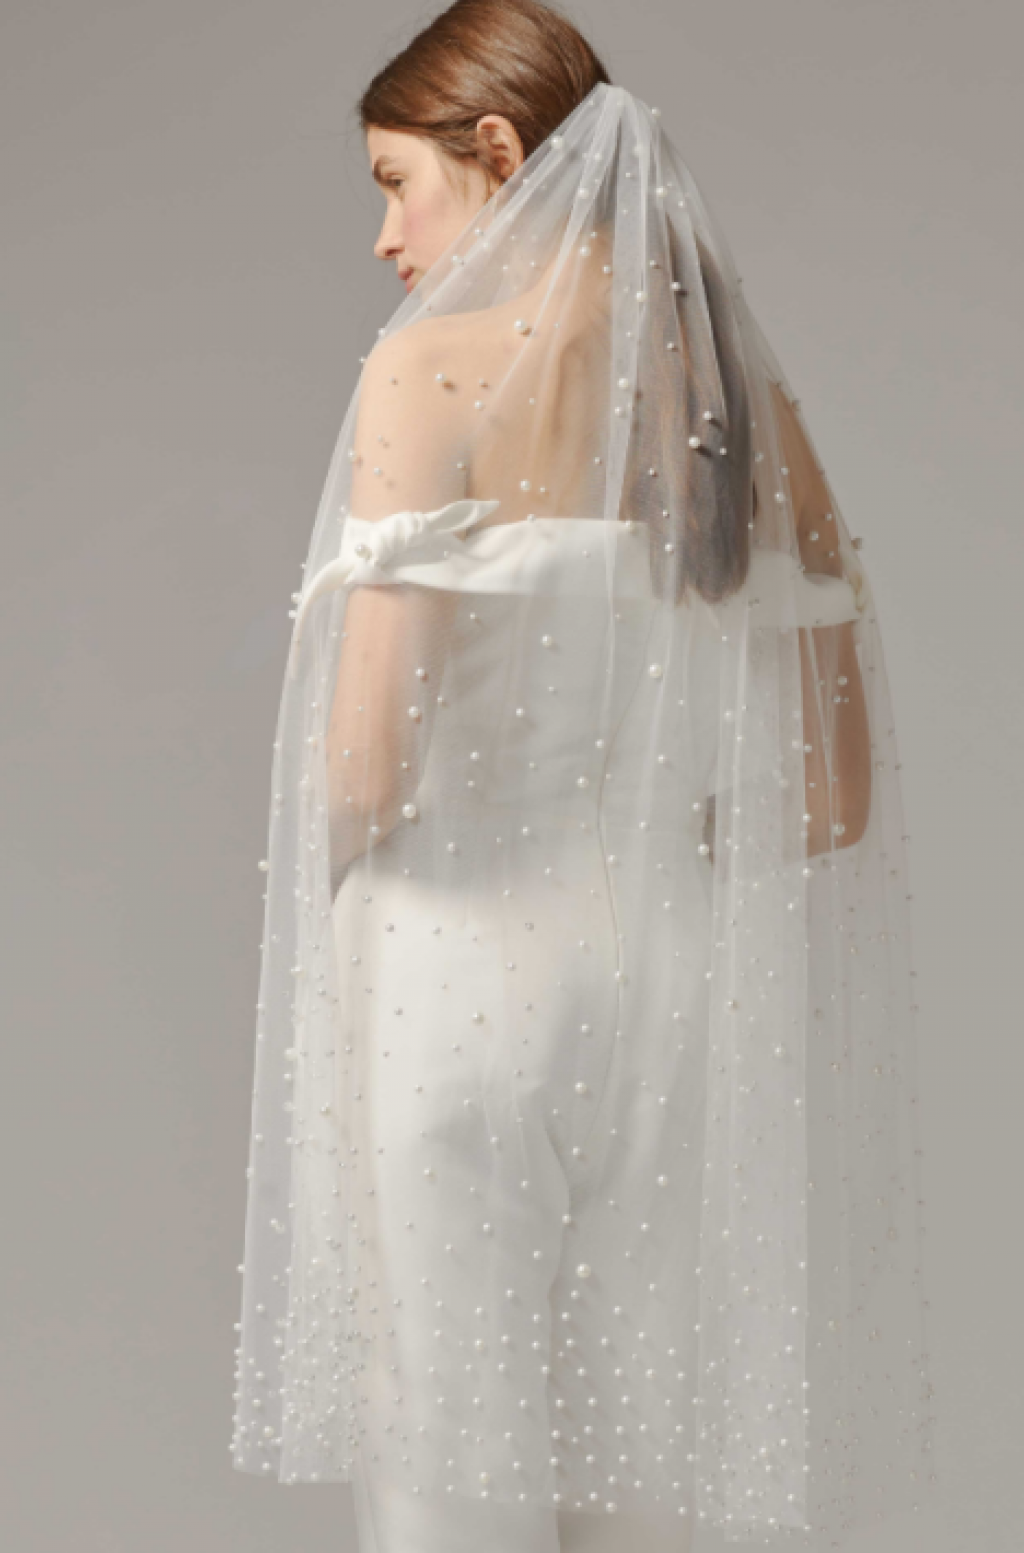 Bride wearing fingertip veil